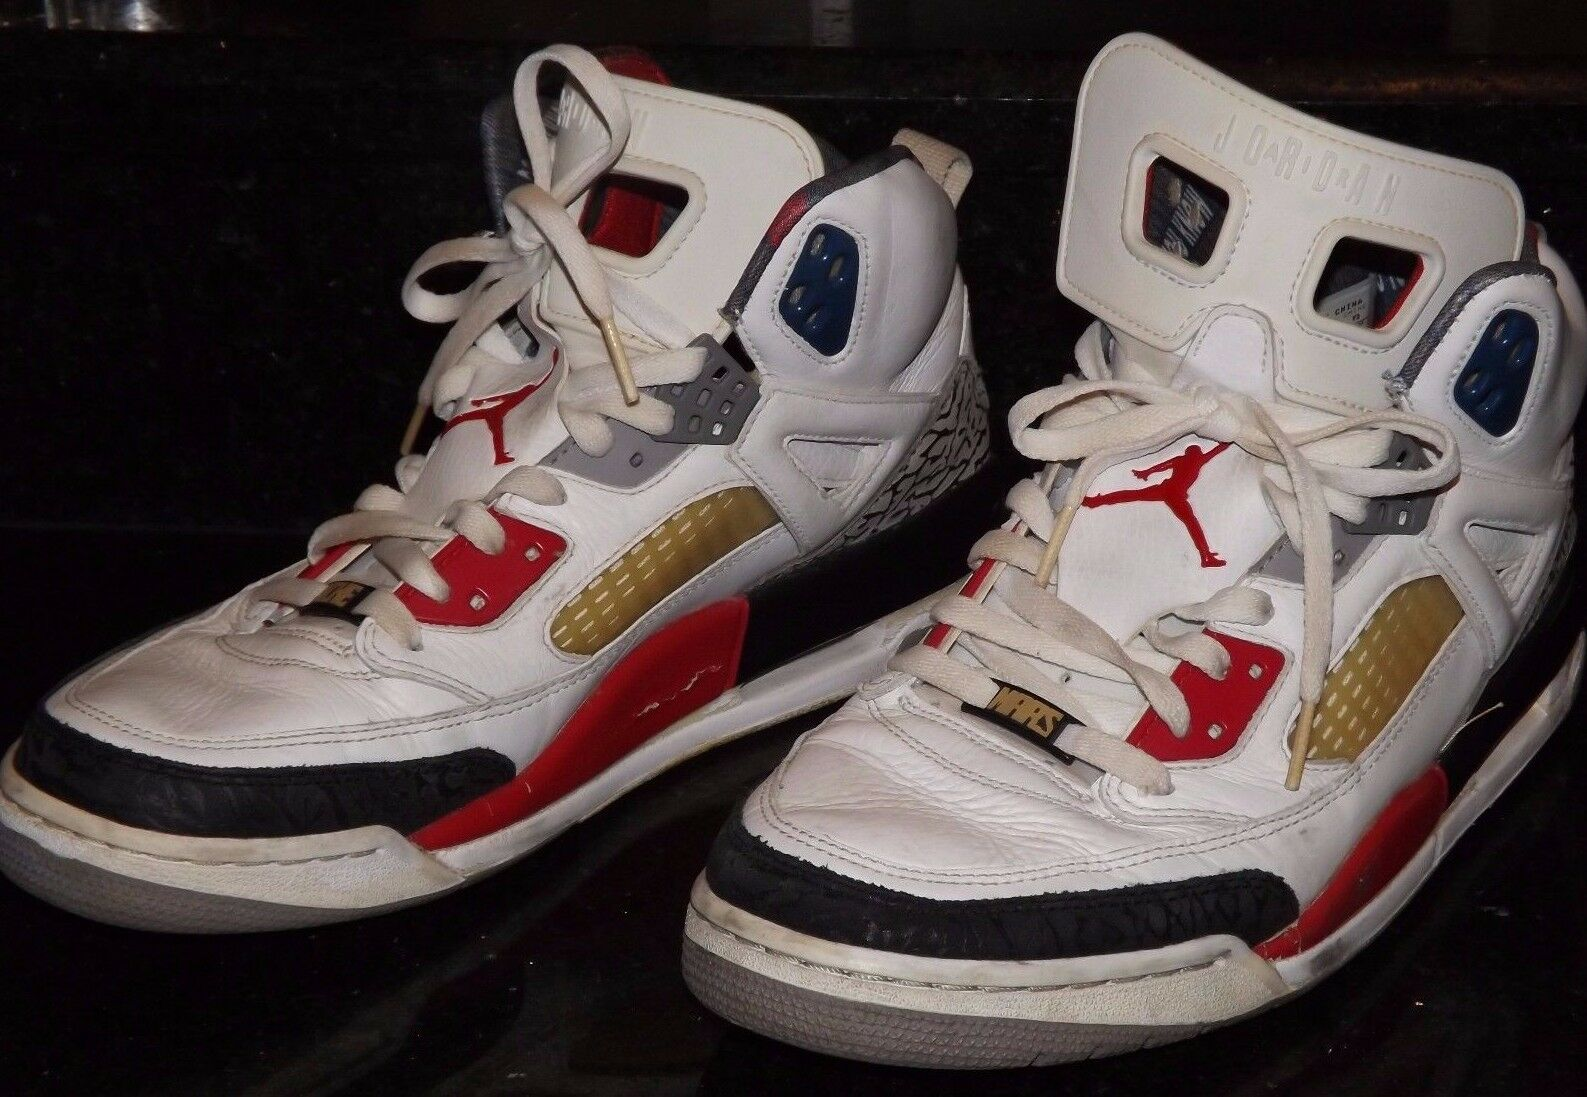 Nike Air Jordan 315371-165 Men's Spizike White/Red/Black 2009 Price reduction